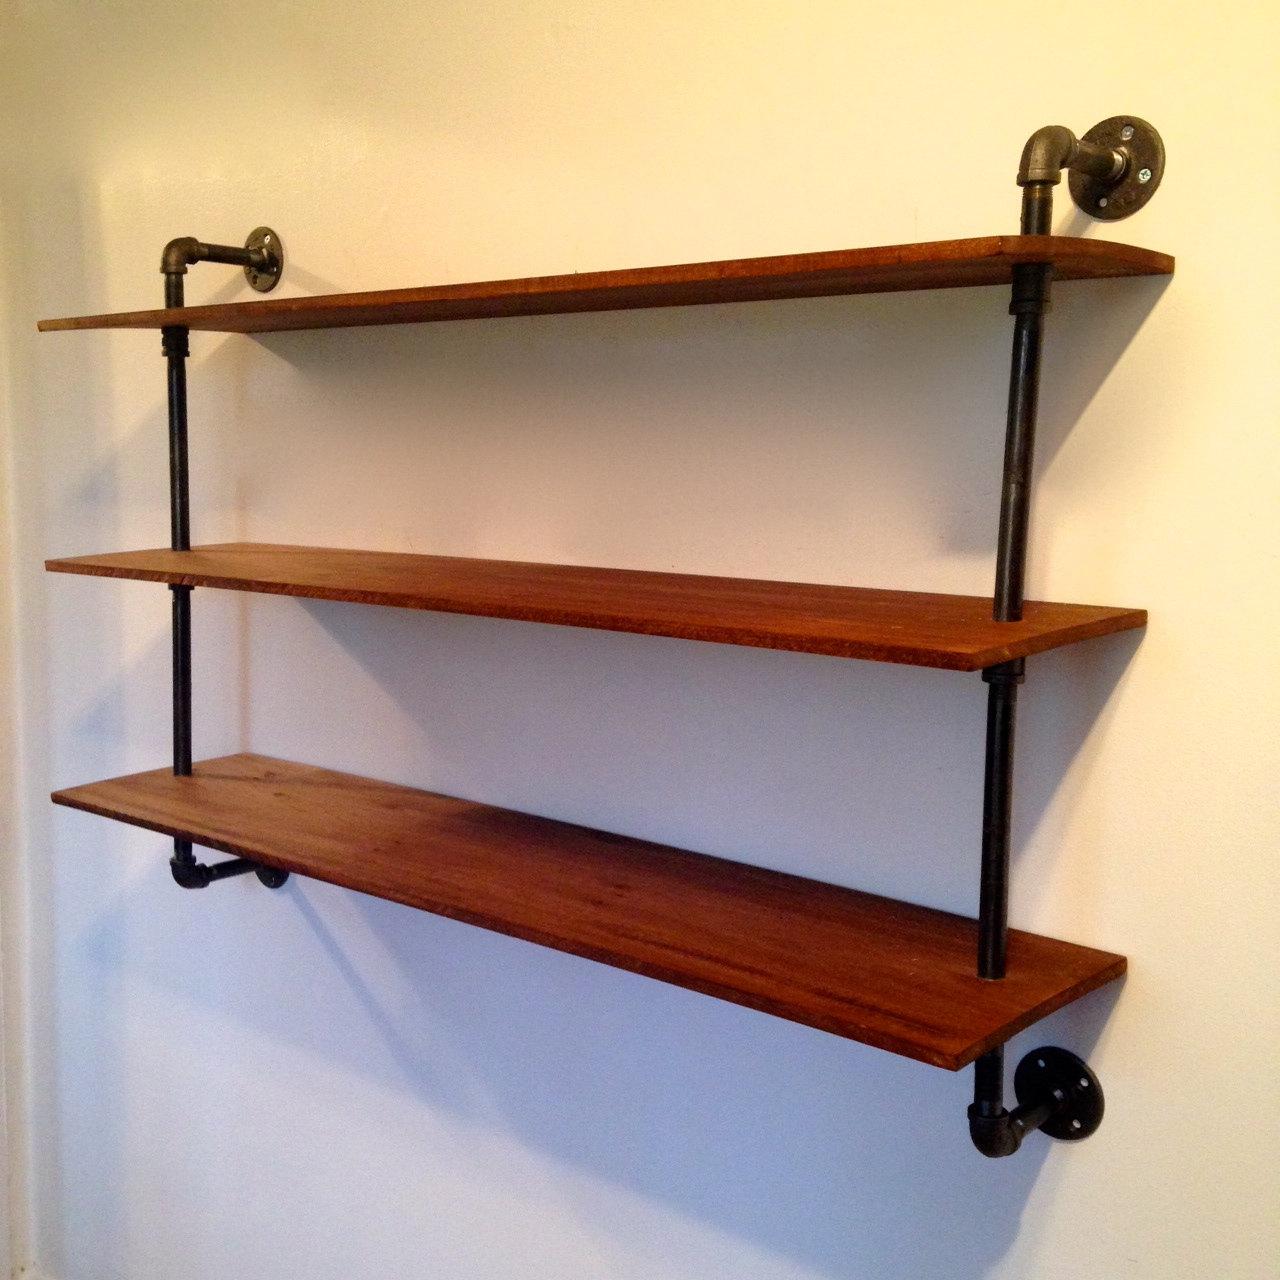 wood wall mounted shelving ideas on foter rh foter com wooden wall mounted shelf unit wooden wall mounted shelving units